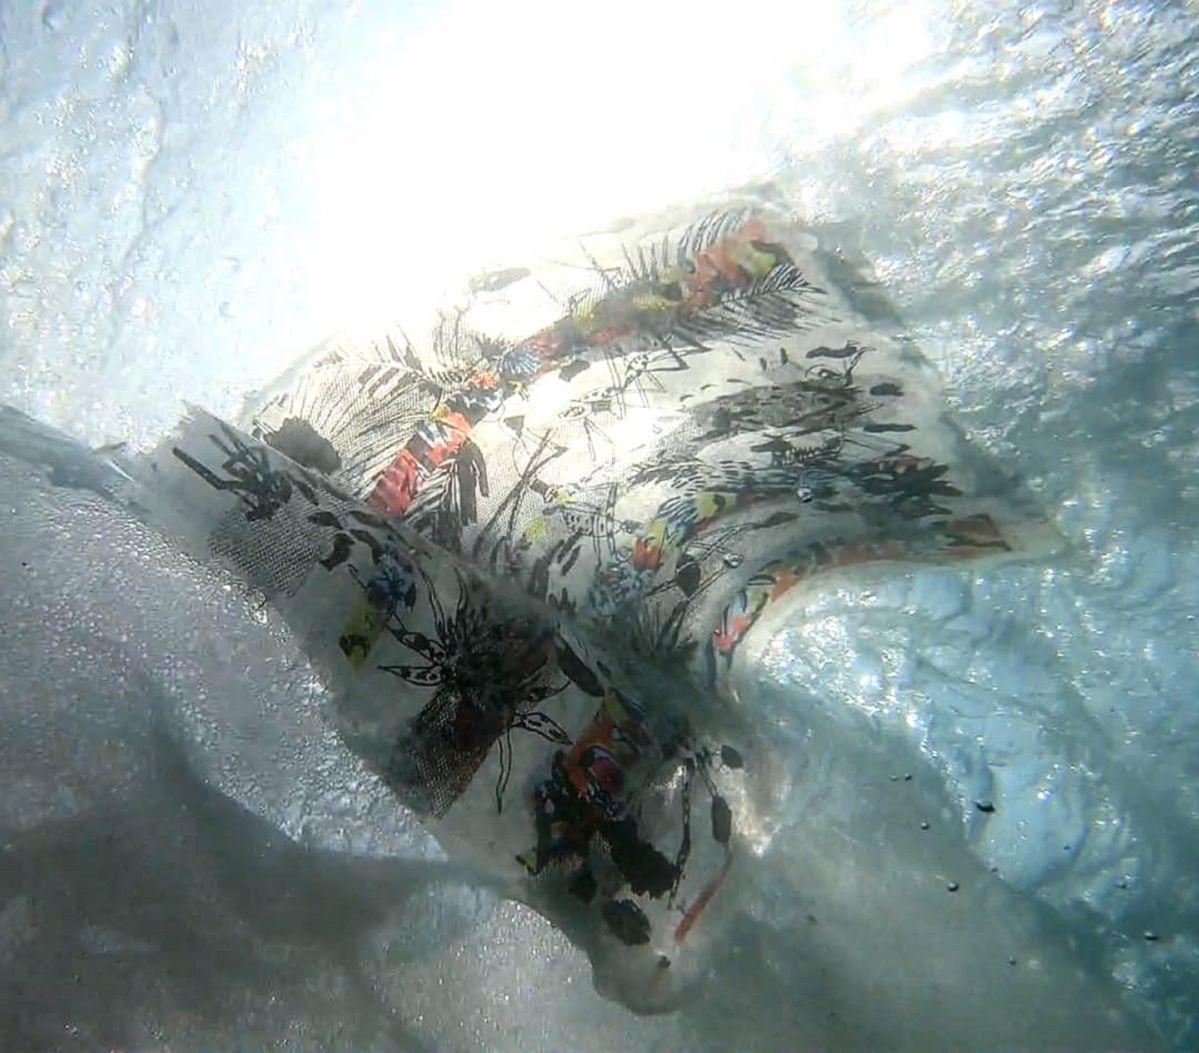 Estrid Lutz, Mosquitoes disappears in ground swells, 2019, capture video, Zicatela, Puerto Escondido